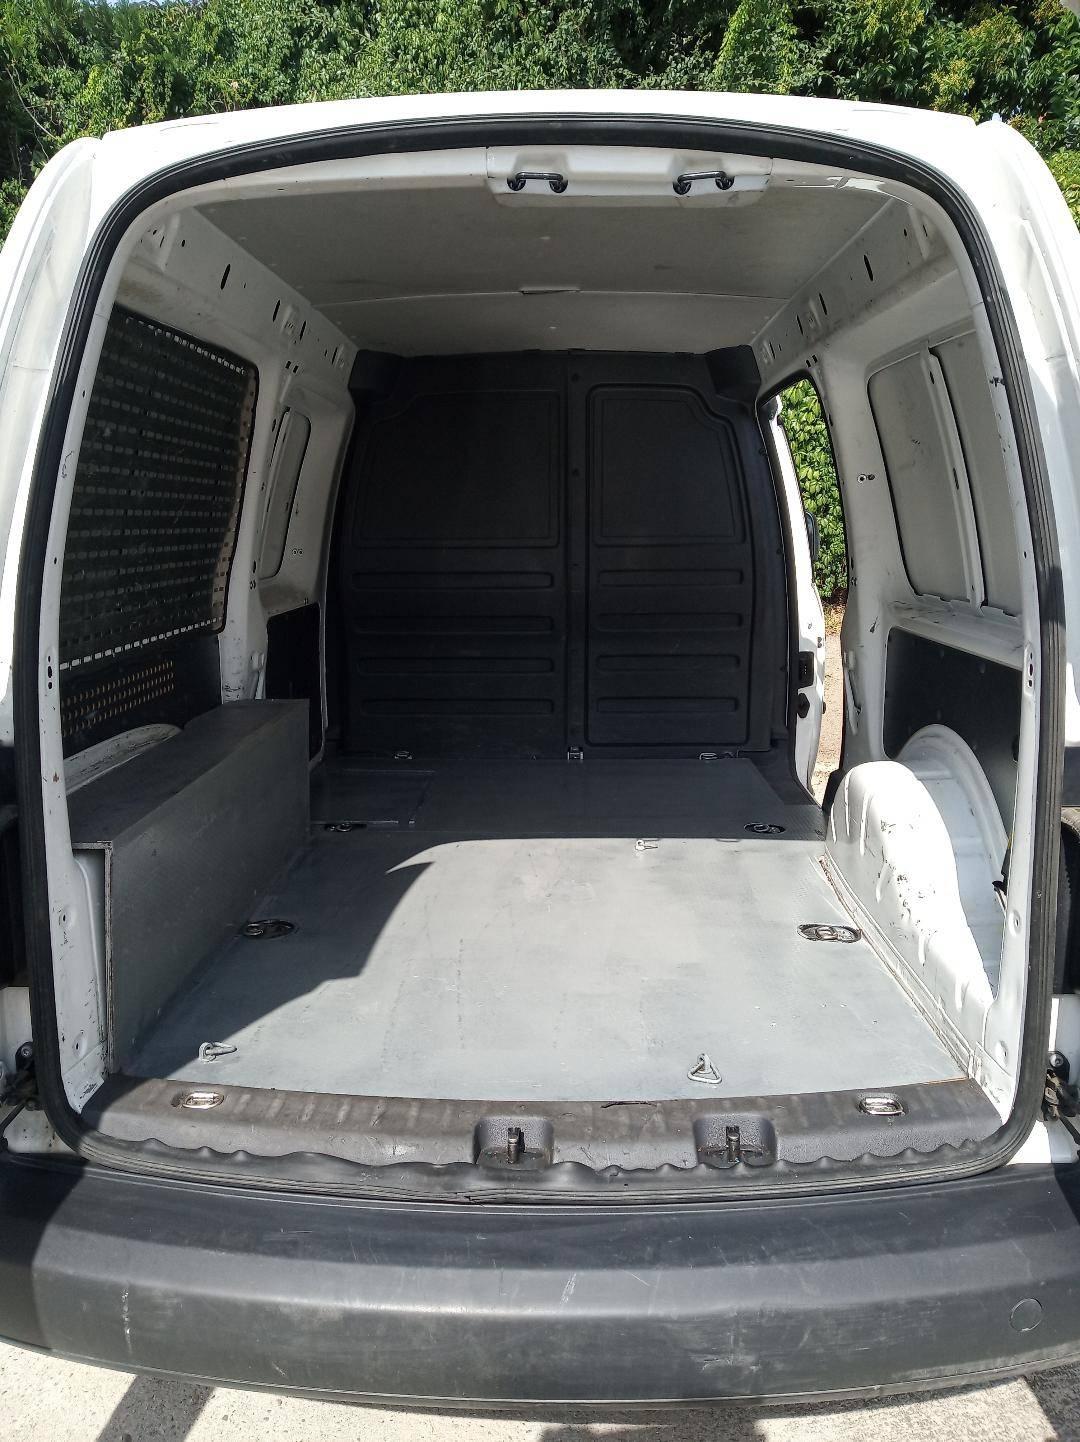 VW. CADDY EXTRALARGA. 2.016. 6.999 €  - Foto 4